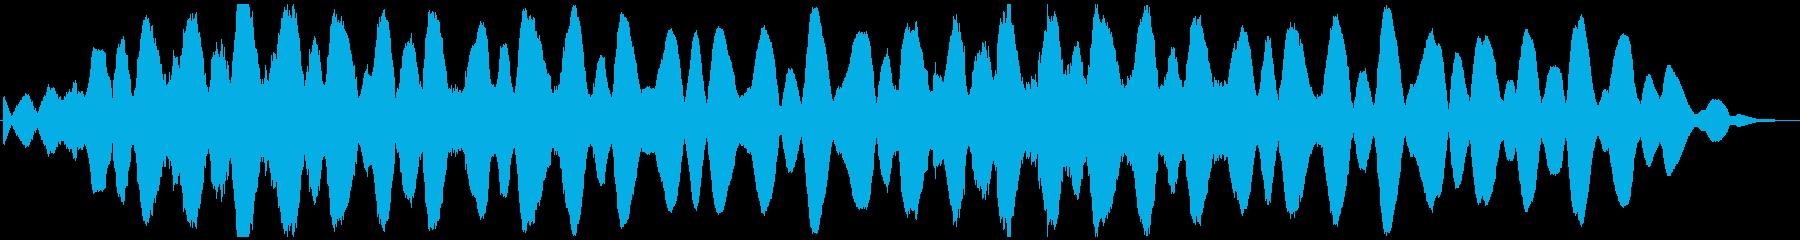 PADS 単調な旋風01の再生済みの波形